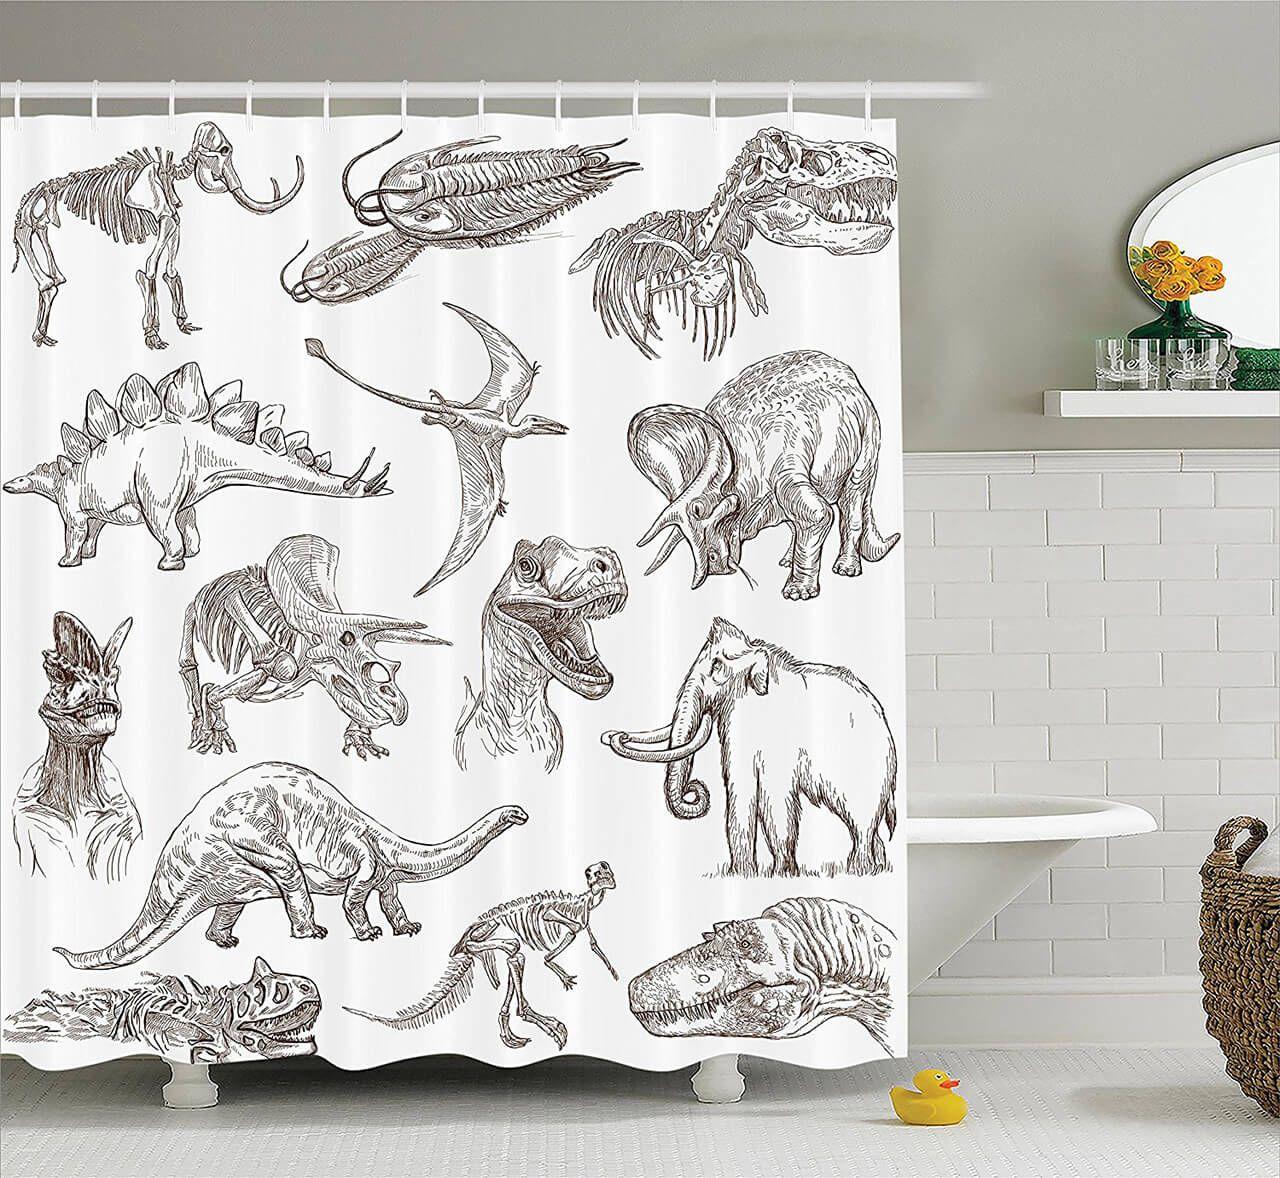 Dinosaur Sketch Curtain Shower Curtain Sets Bathroom